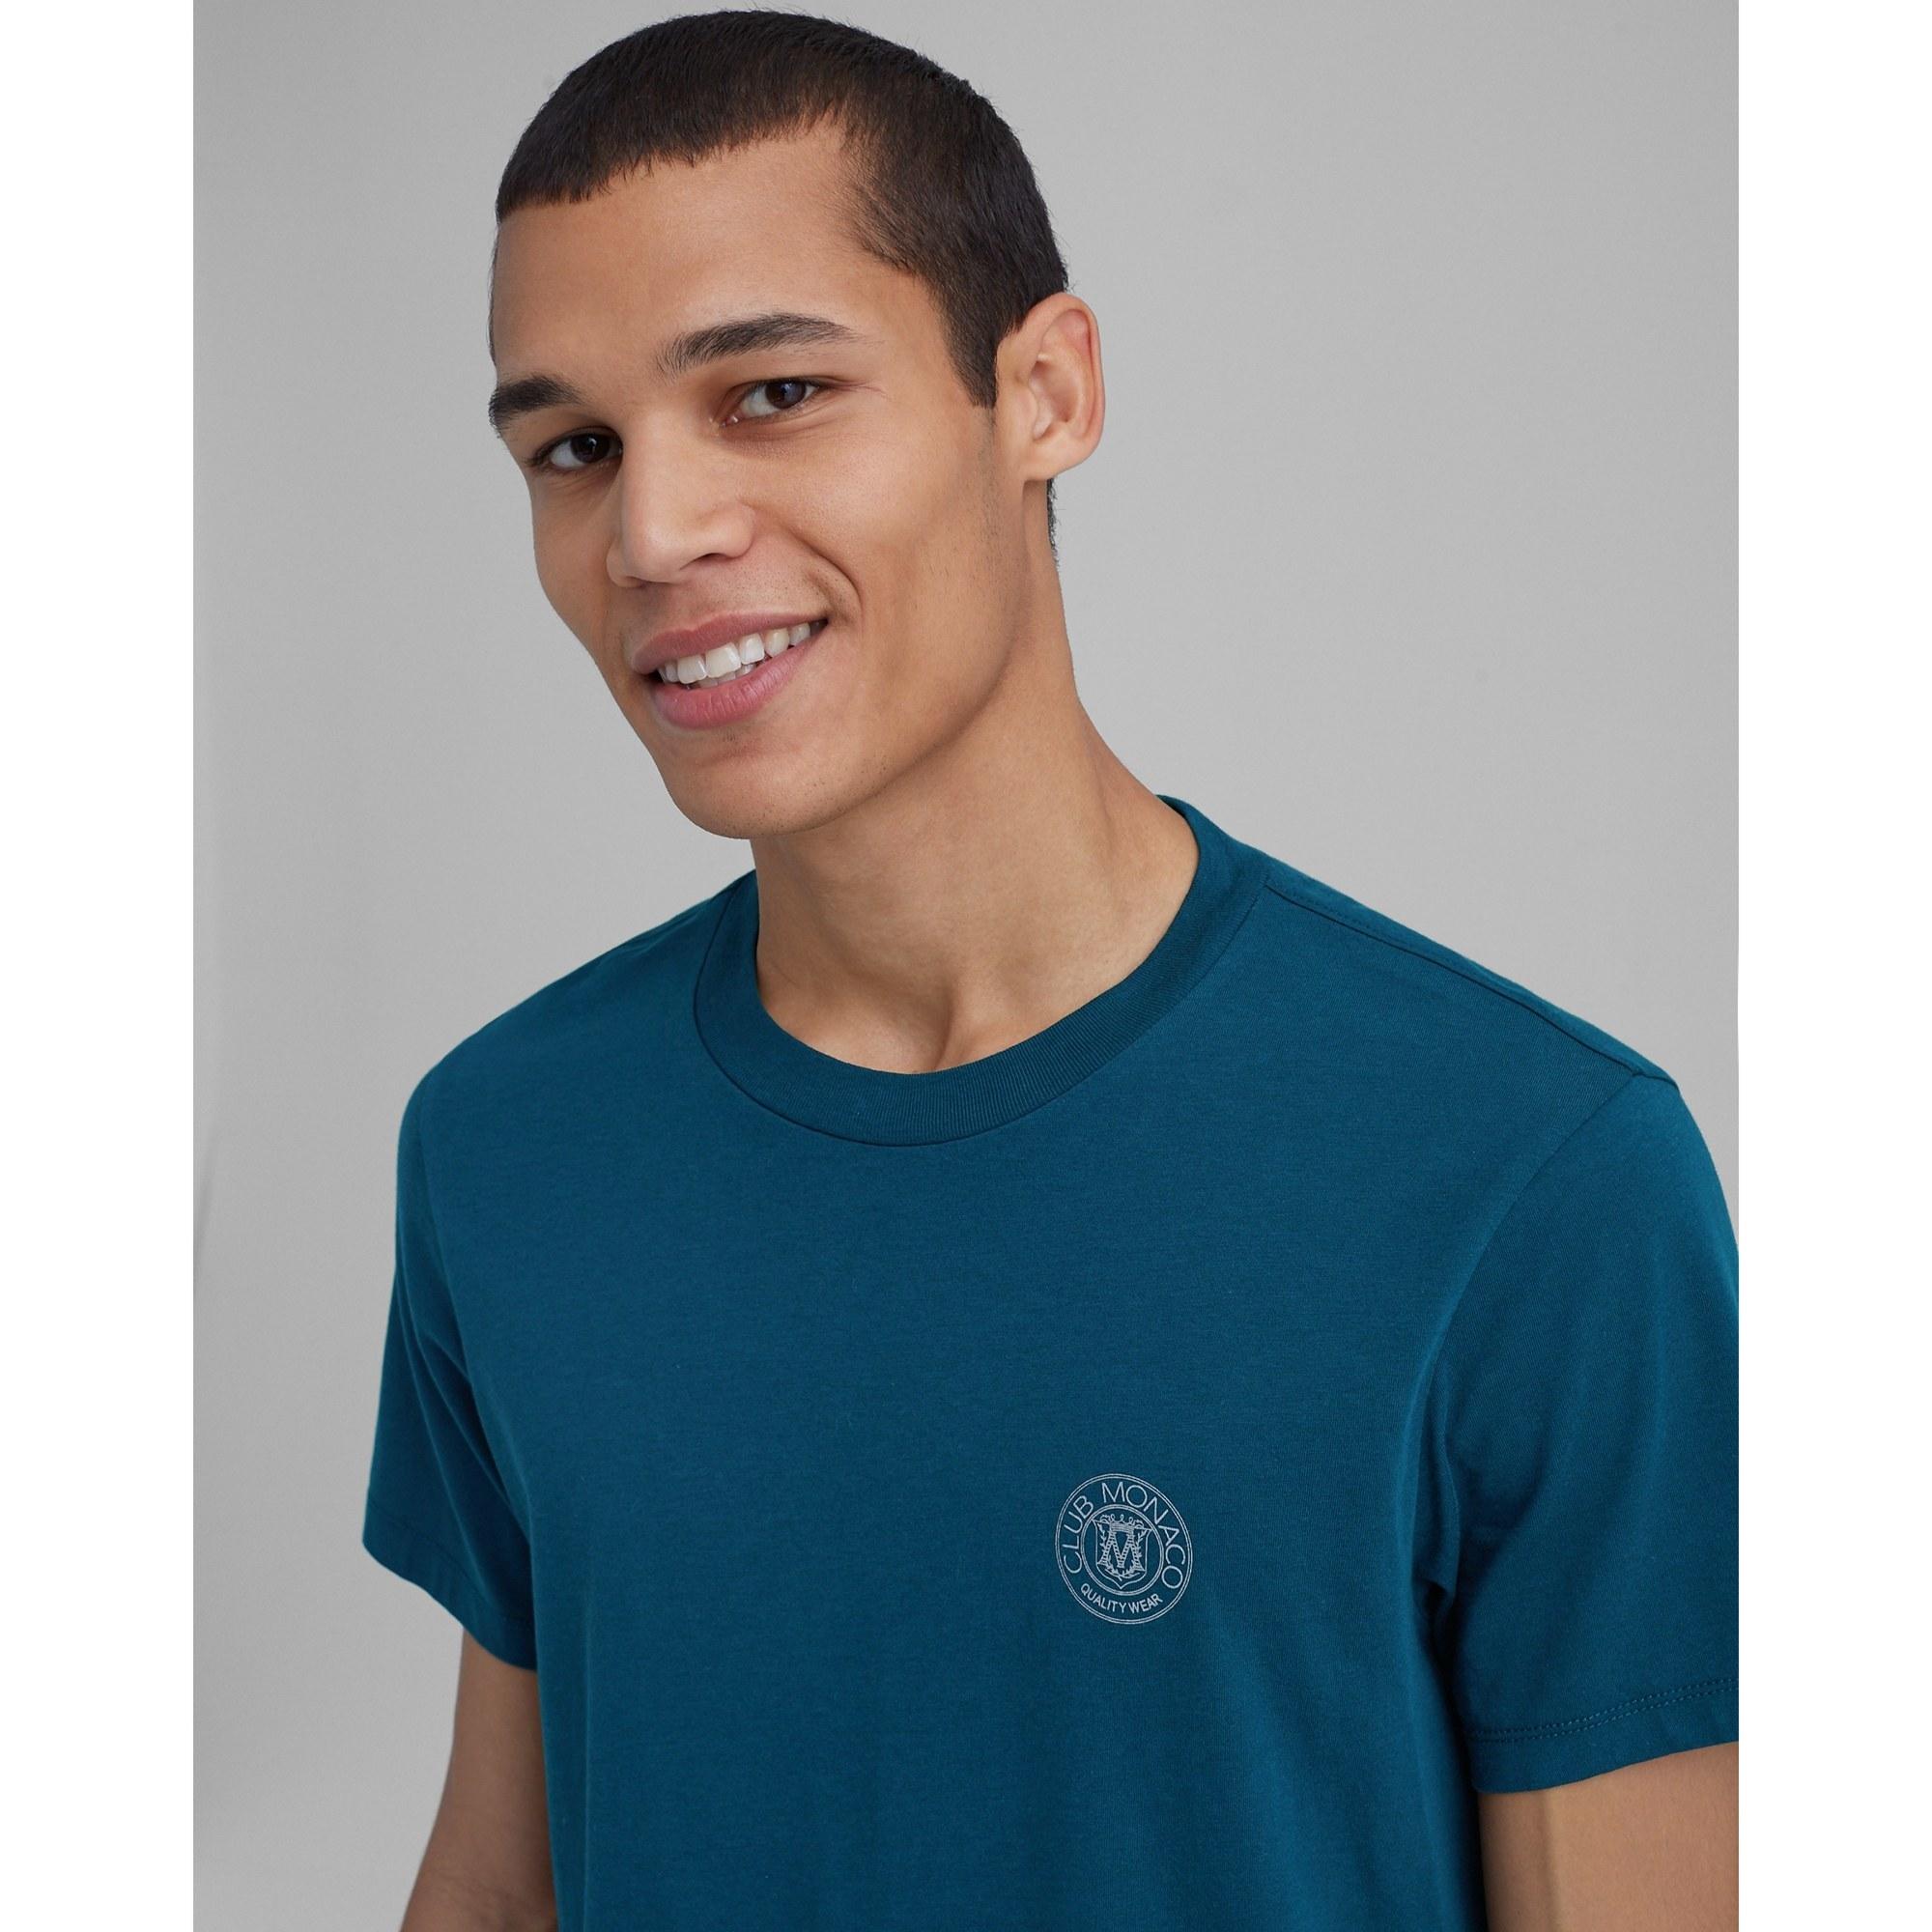 person wearing the club monaco shirt